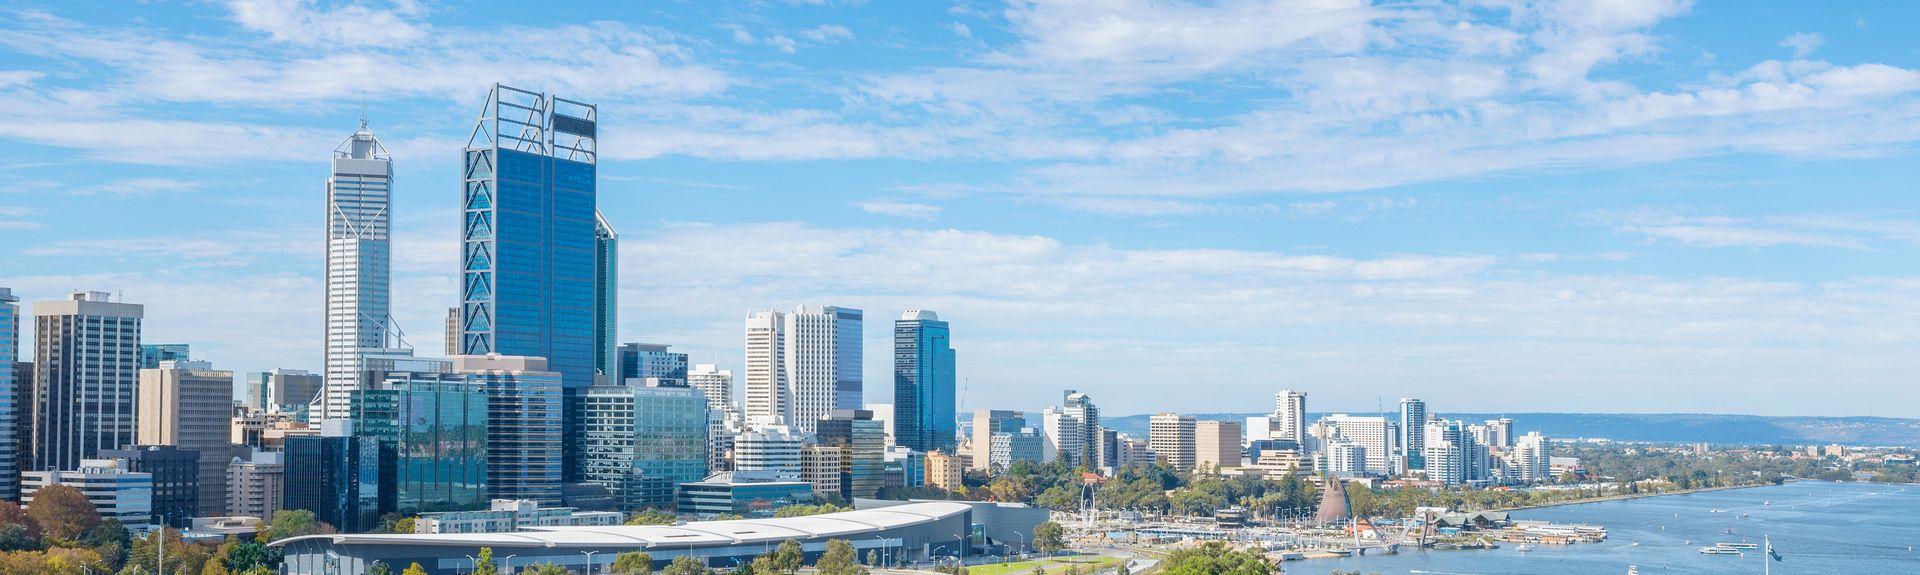 City of Perth, WA, Australia